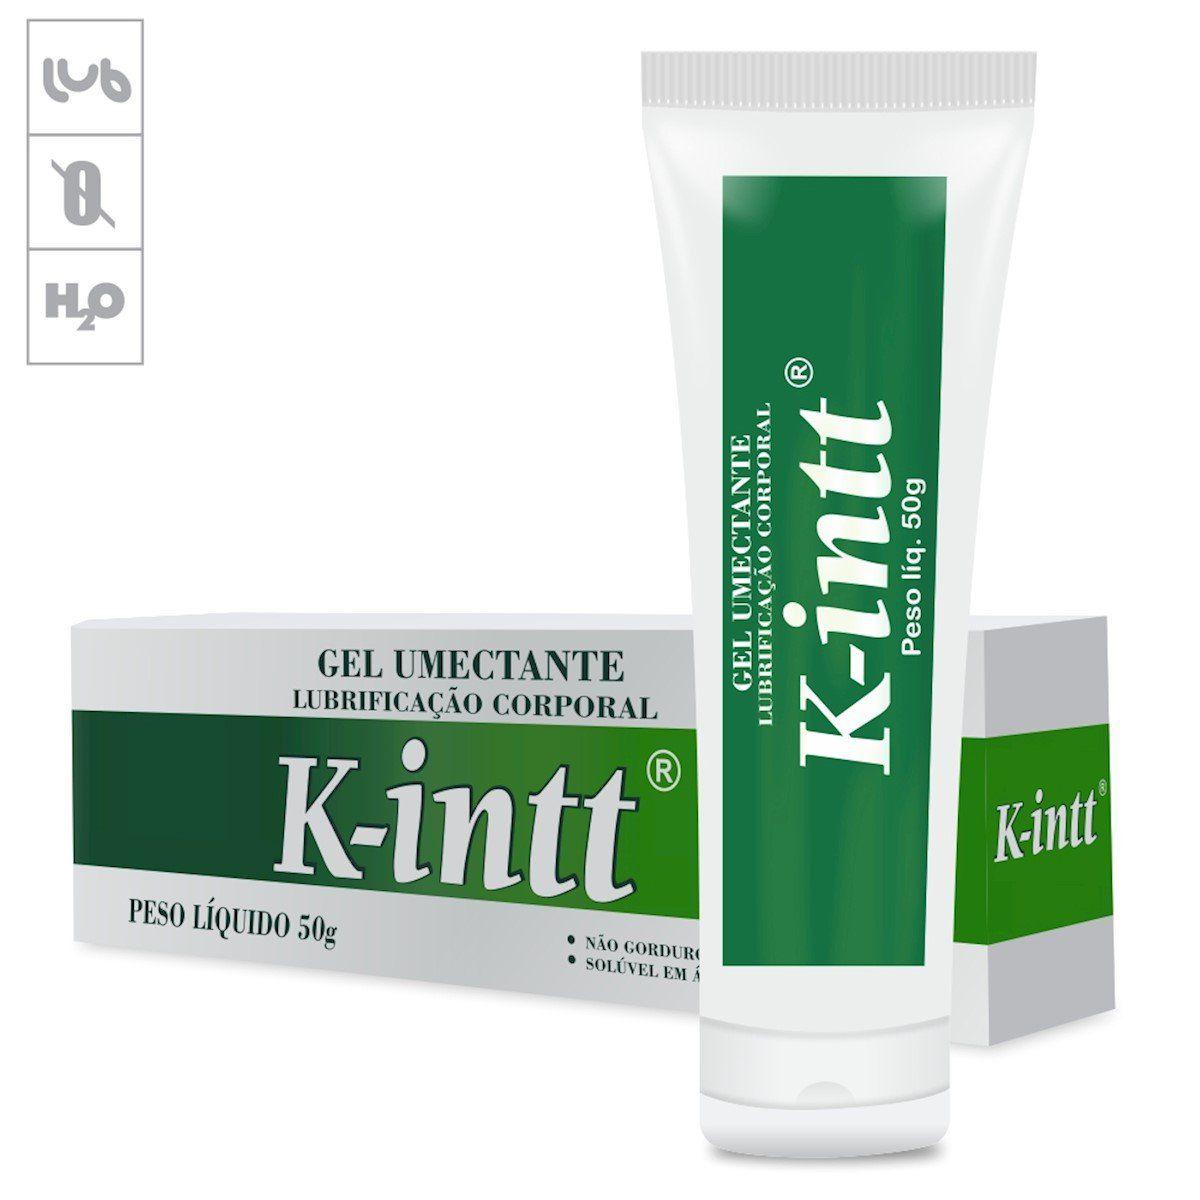 Gel Lubrificante Íntimo K-Intt - 50g